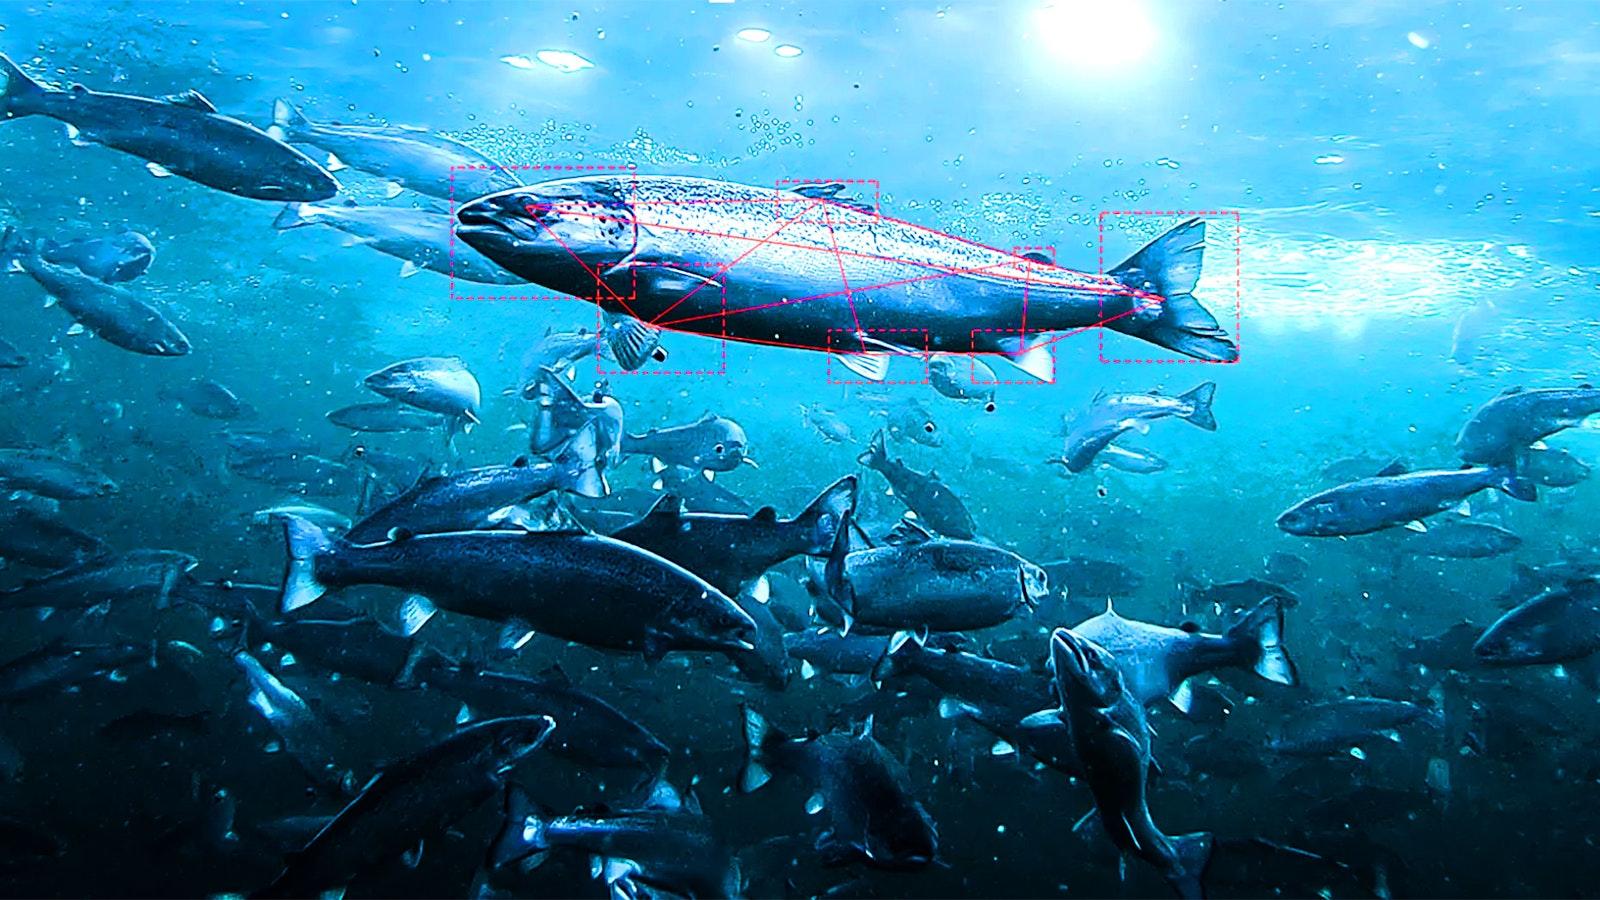 Fish captured by an Aquabyte camera. Image: Aquabyte